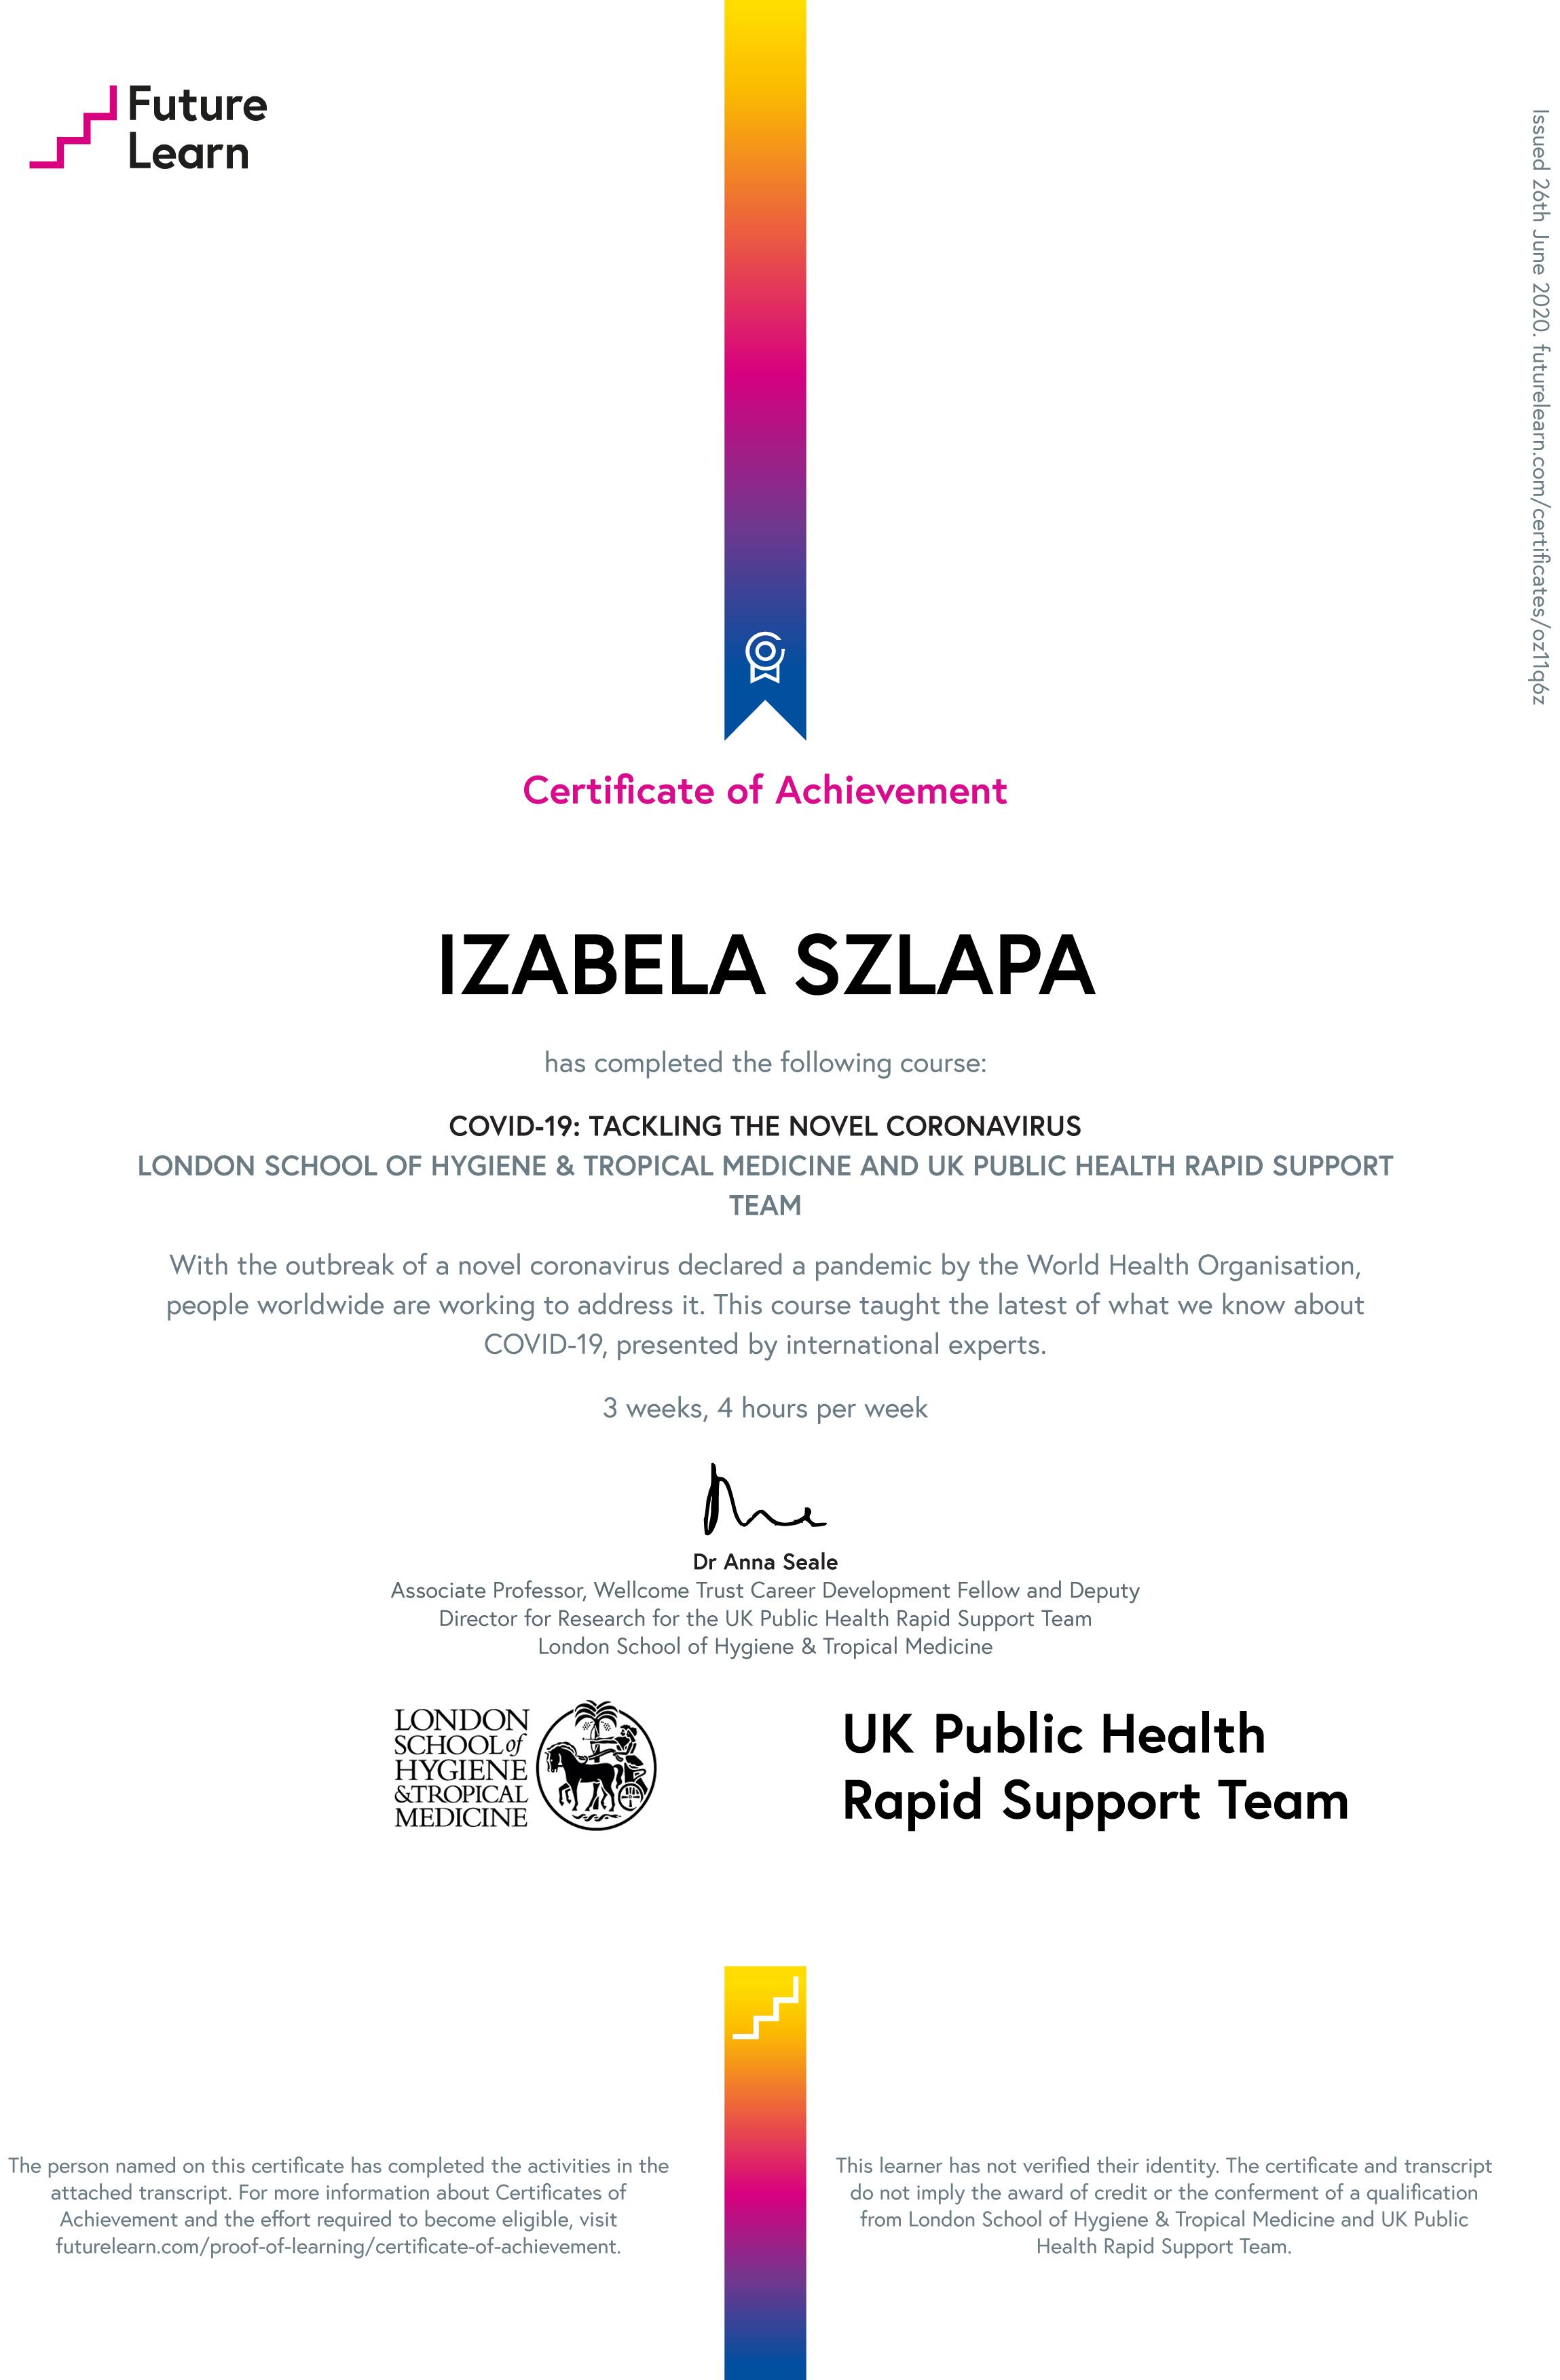 covid19-novel-coronavirus_certificate_of